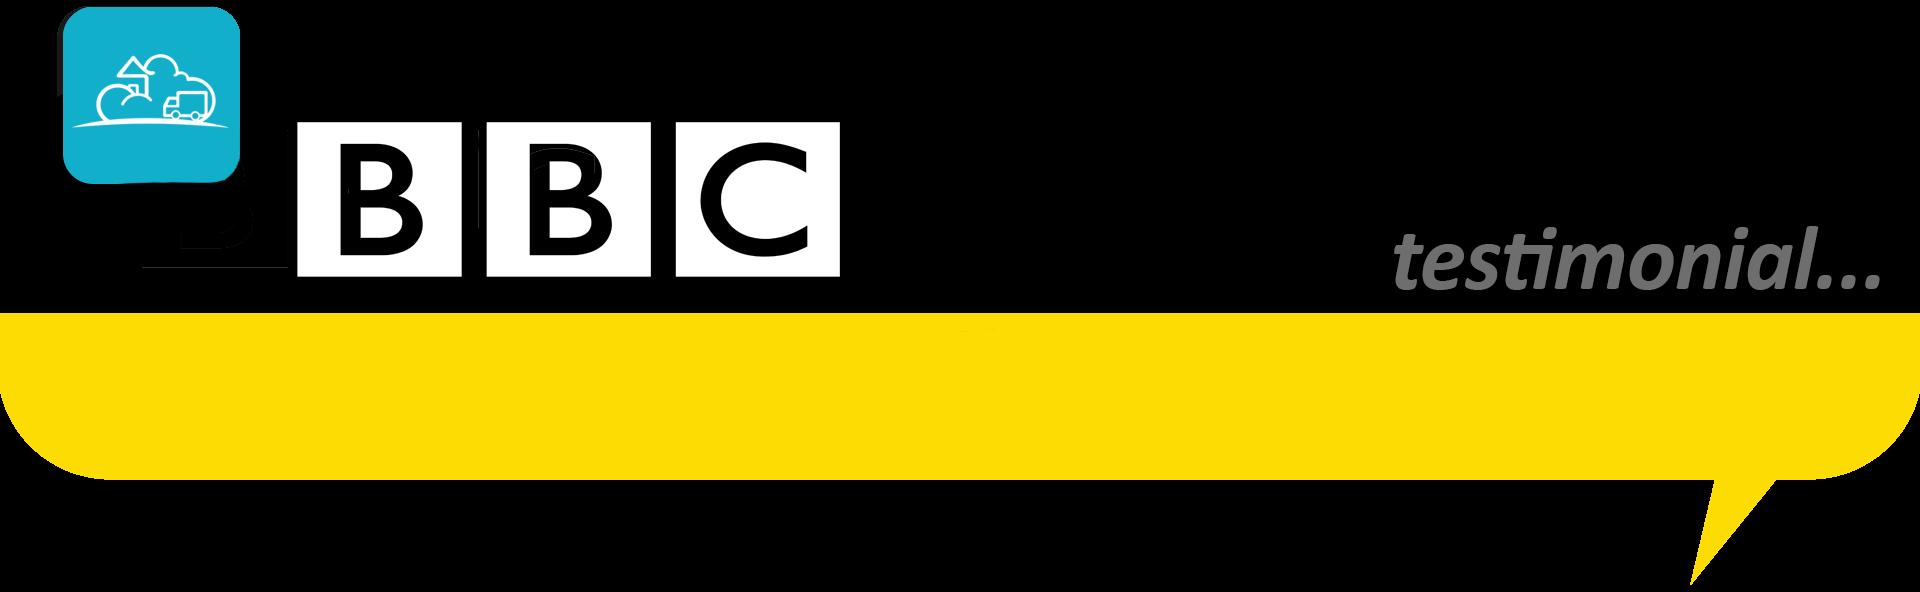 BBC logo in a speech bubble banner